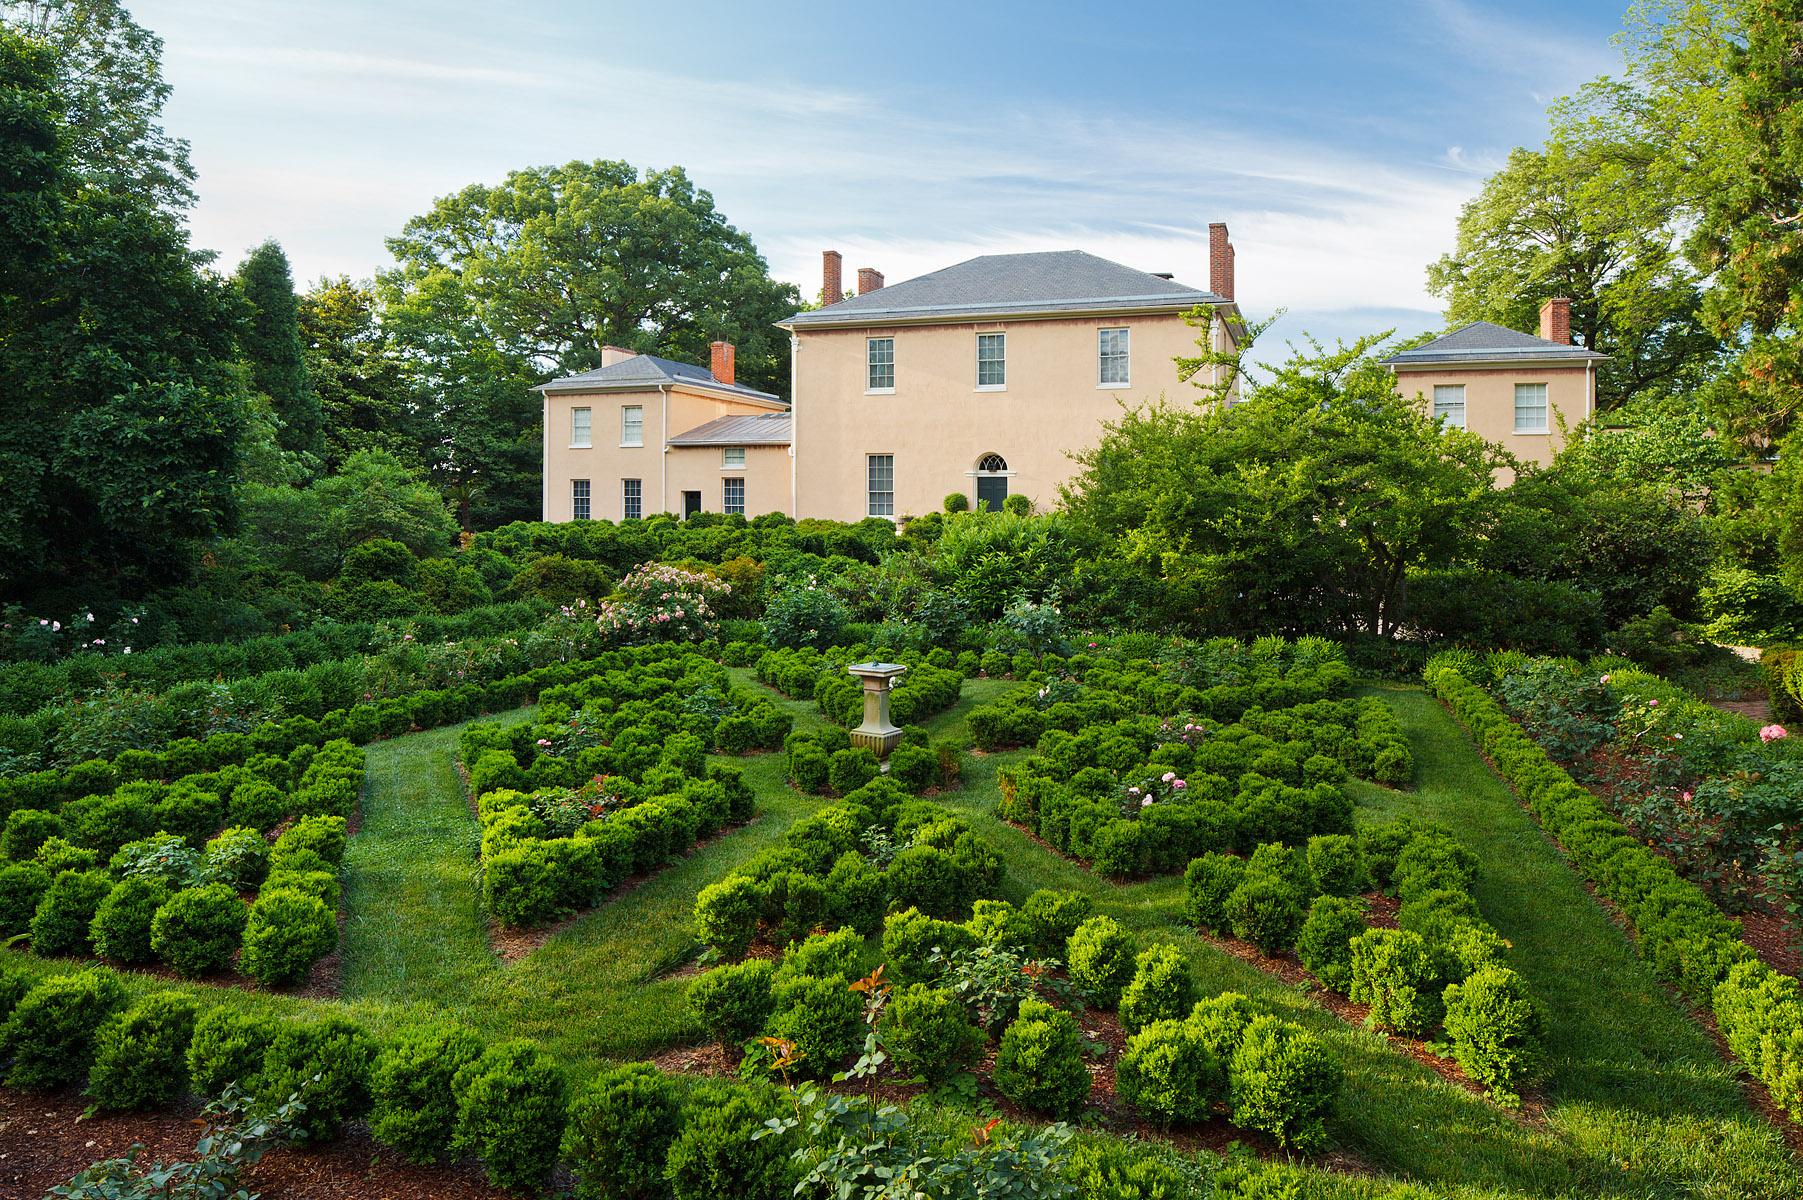 Tudor Place Historic House and GardenWashington, DCTudor Place